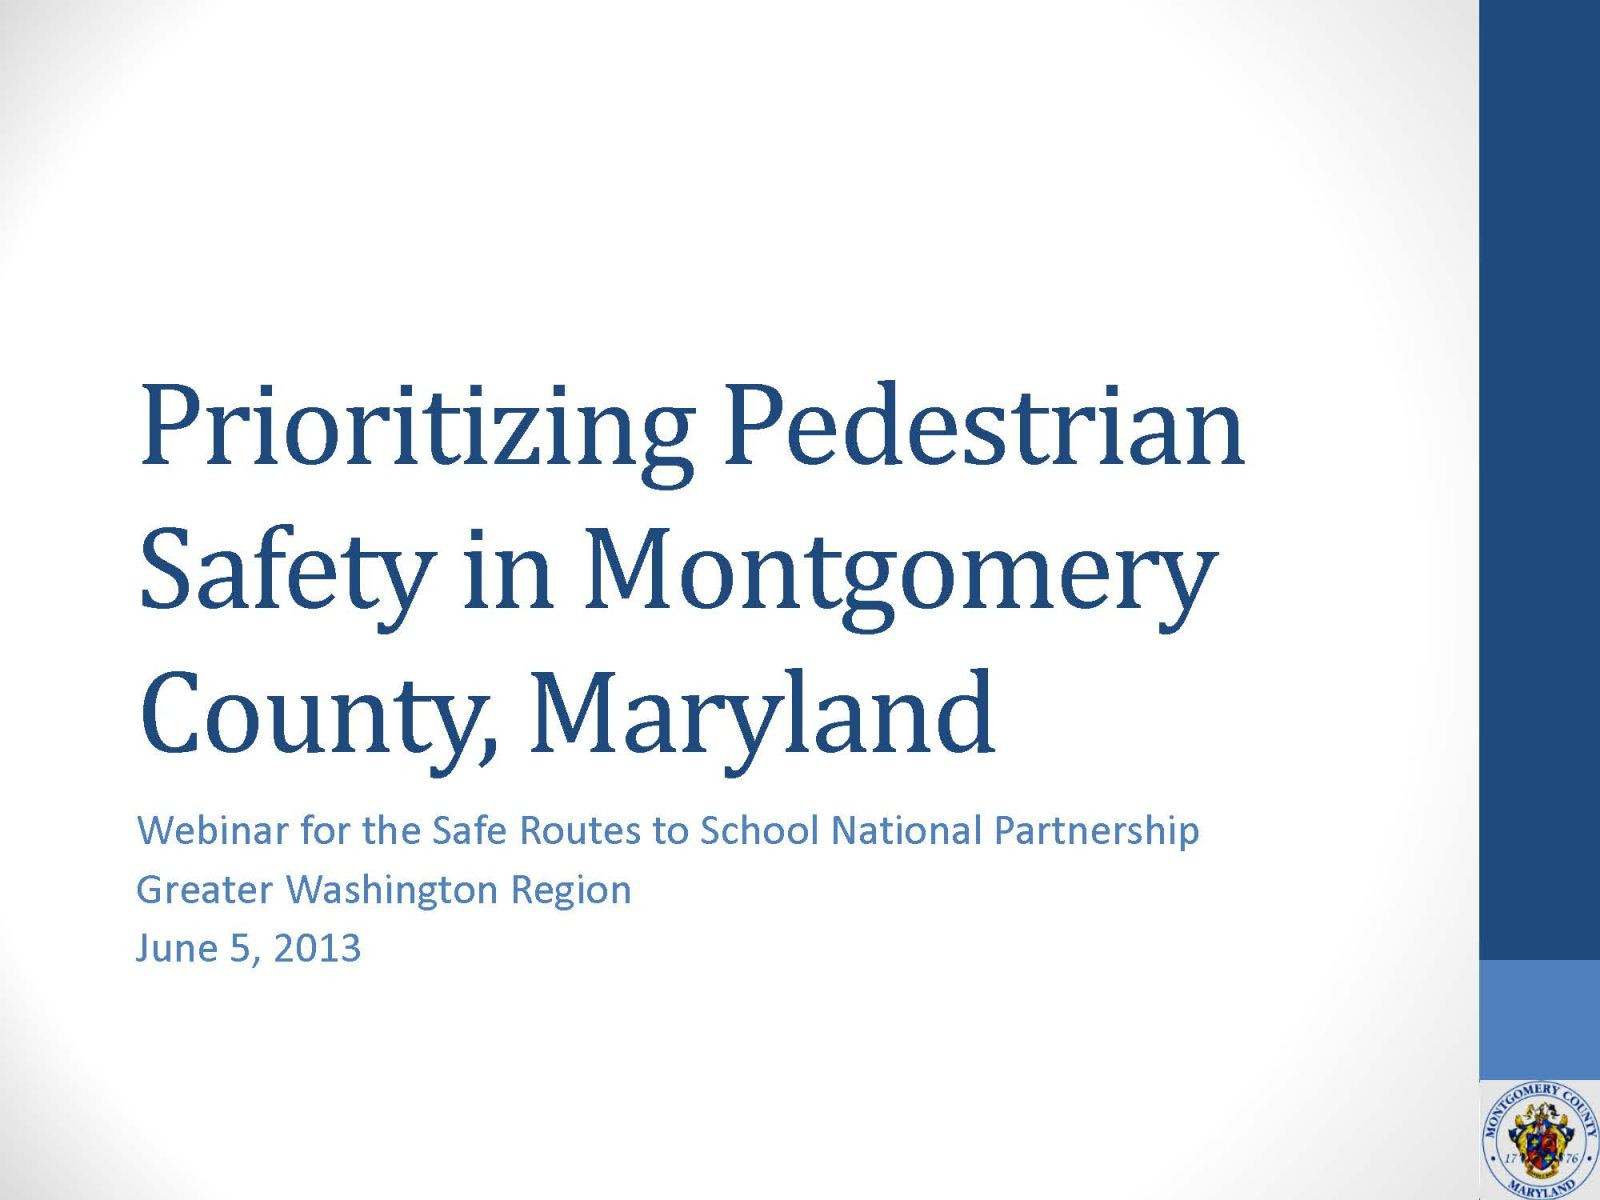 Montgomery County Pedestrian Safety Webinar